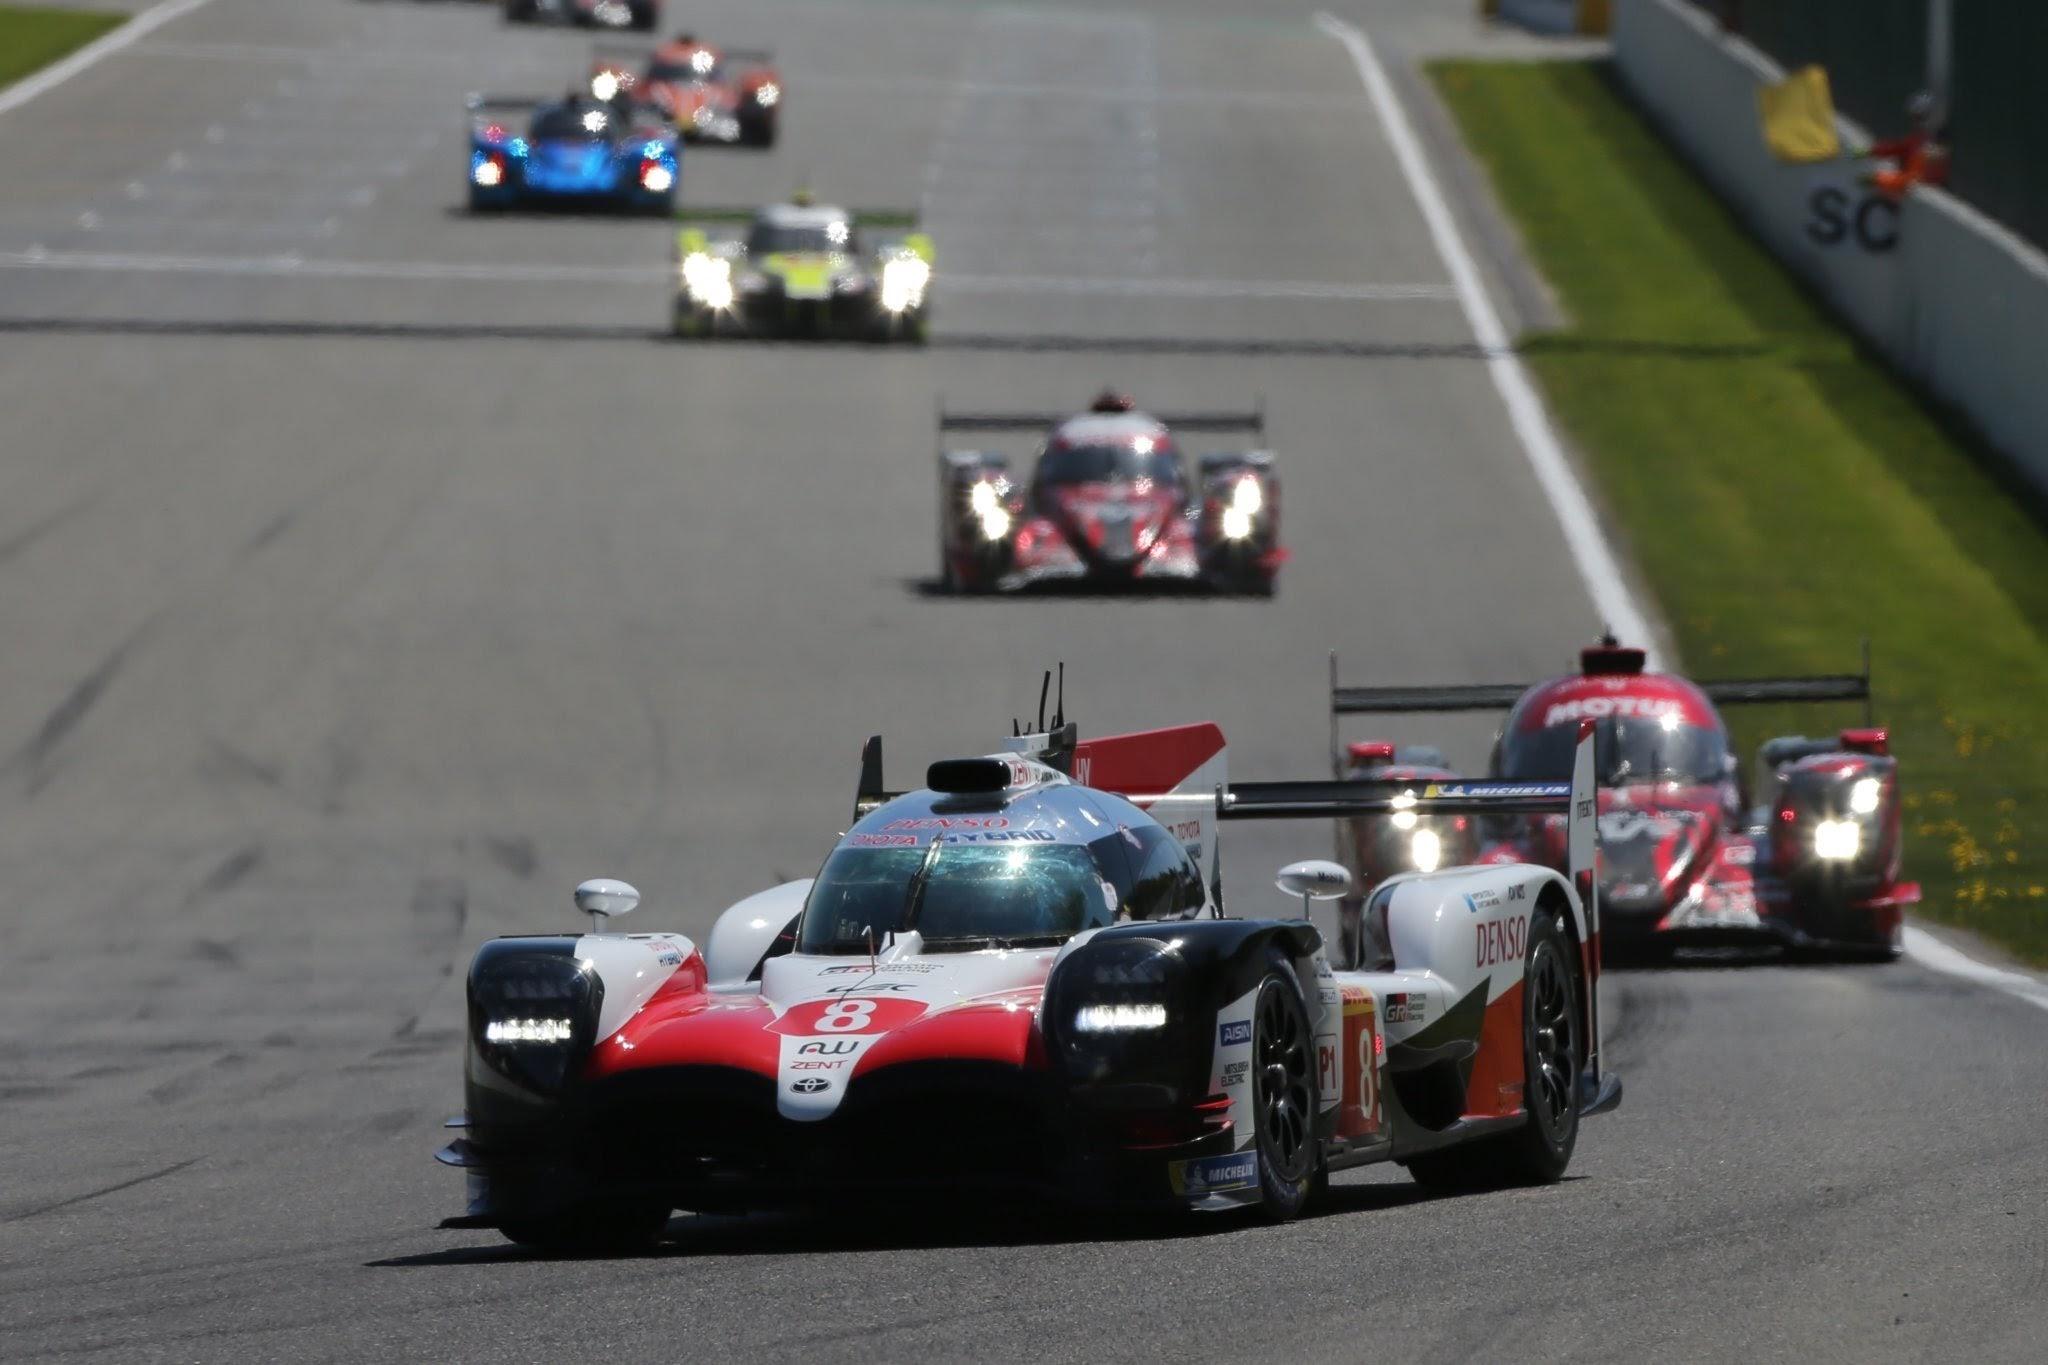 tbFt6LcZUlpu13i33whon2SM8skwtLG2t0RFytlPbRX5oh6RqmCZTbkGPdeq9X6nWsLPhHMCP046XQjtHNQnuImKkYOSa3BggqReglmNZfyu14TuYPBzbeFX7BArR15qme9X9bzCBg=w2400 - Victoria para Alonso y doblete de Toyota en Spa-Francorchamps